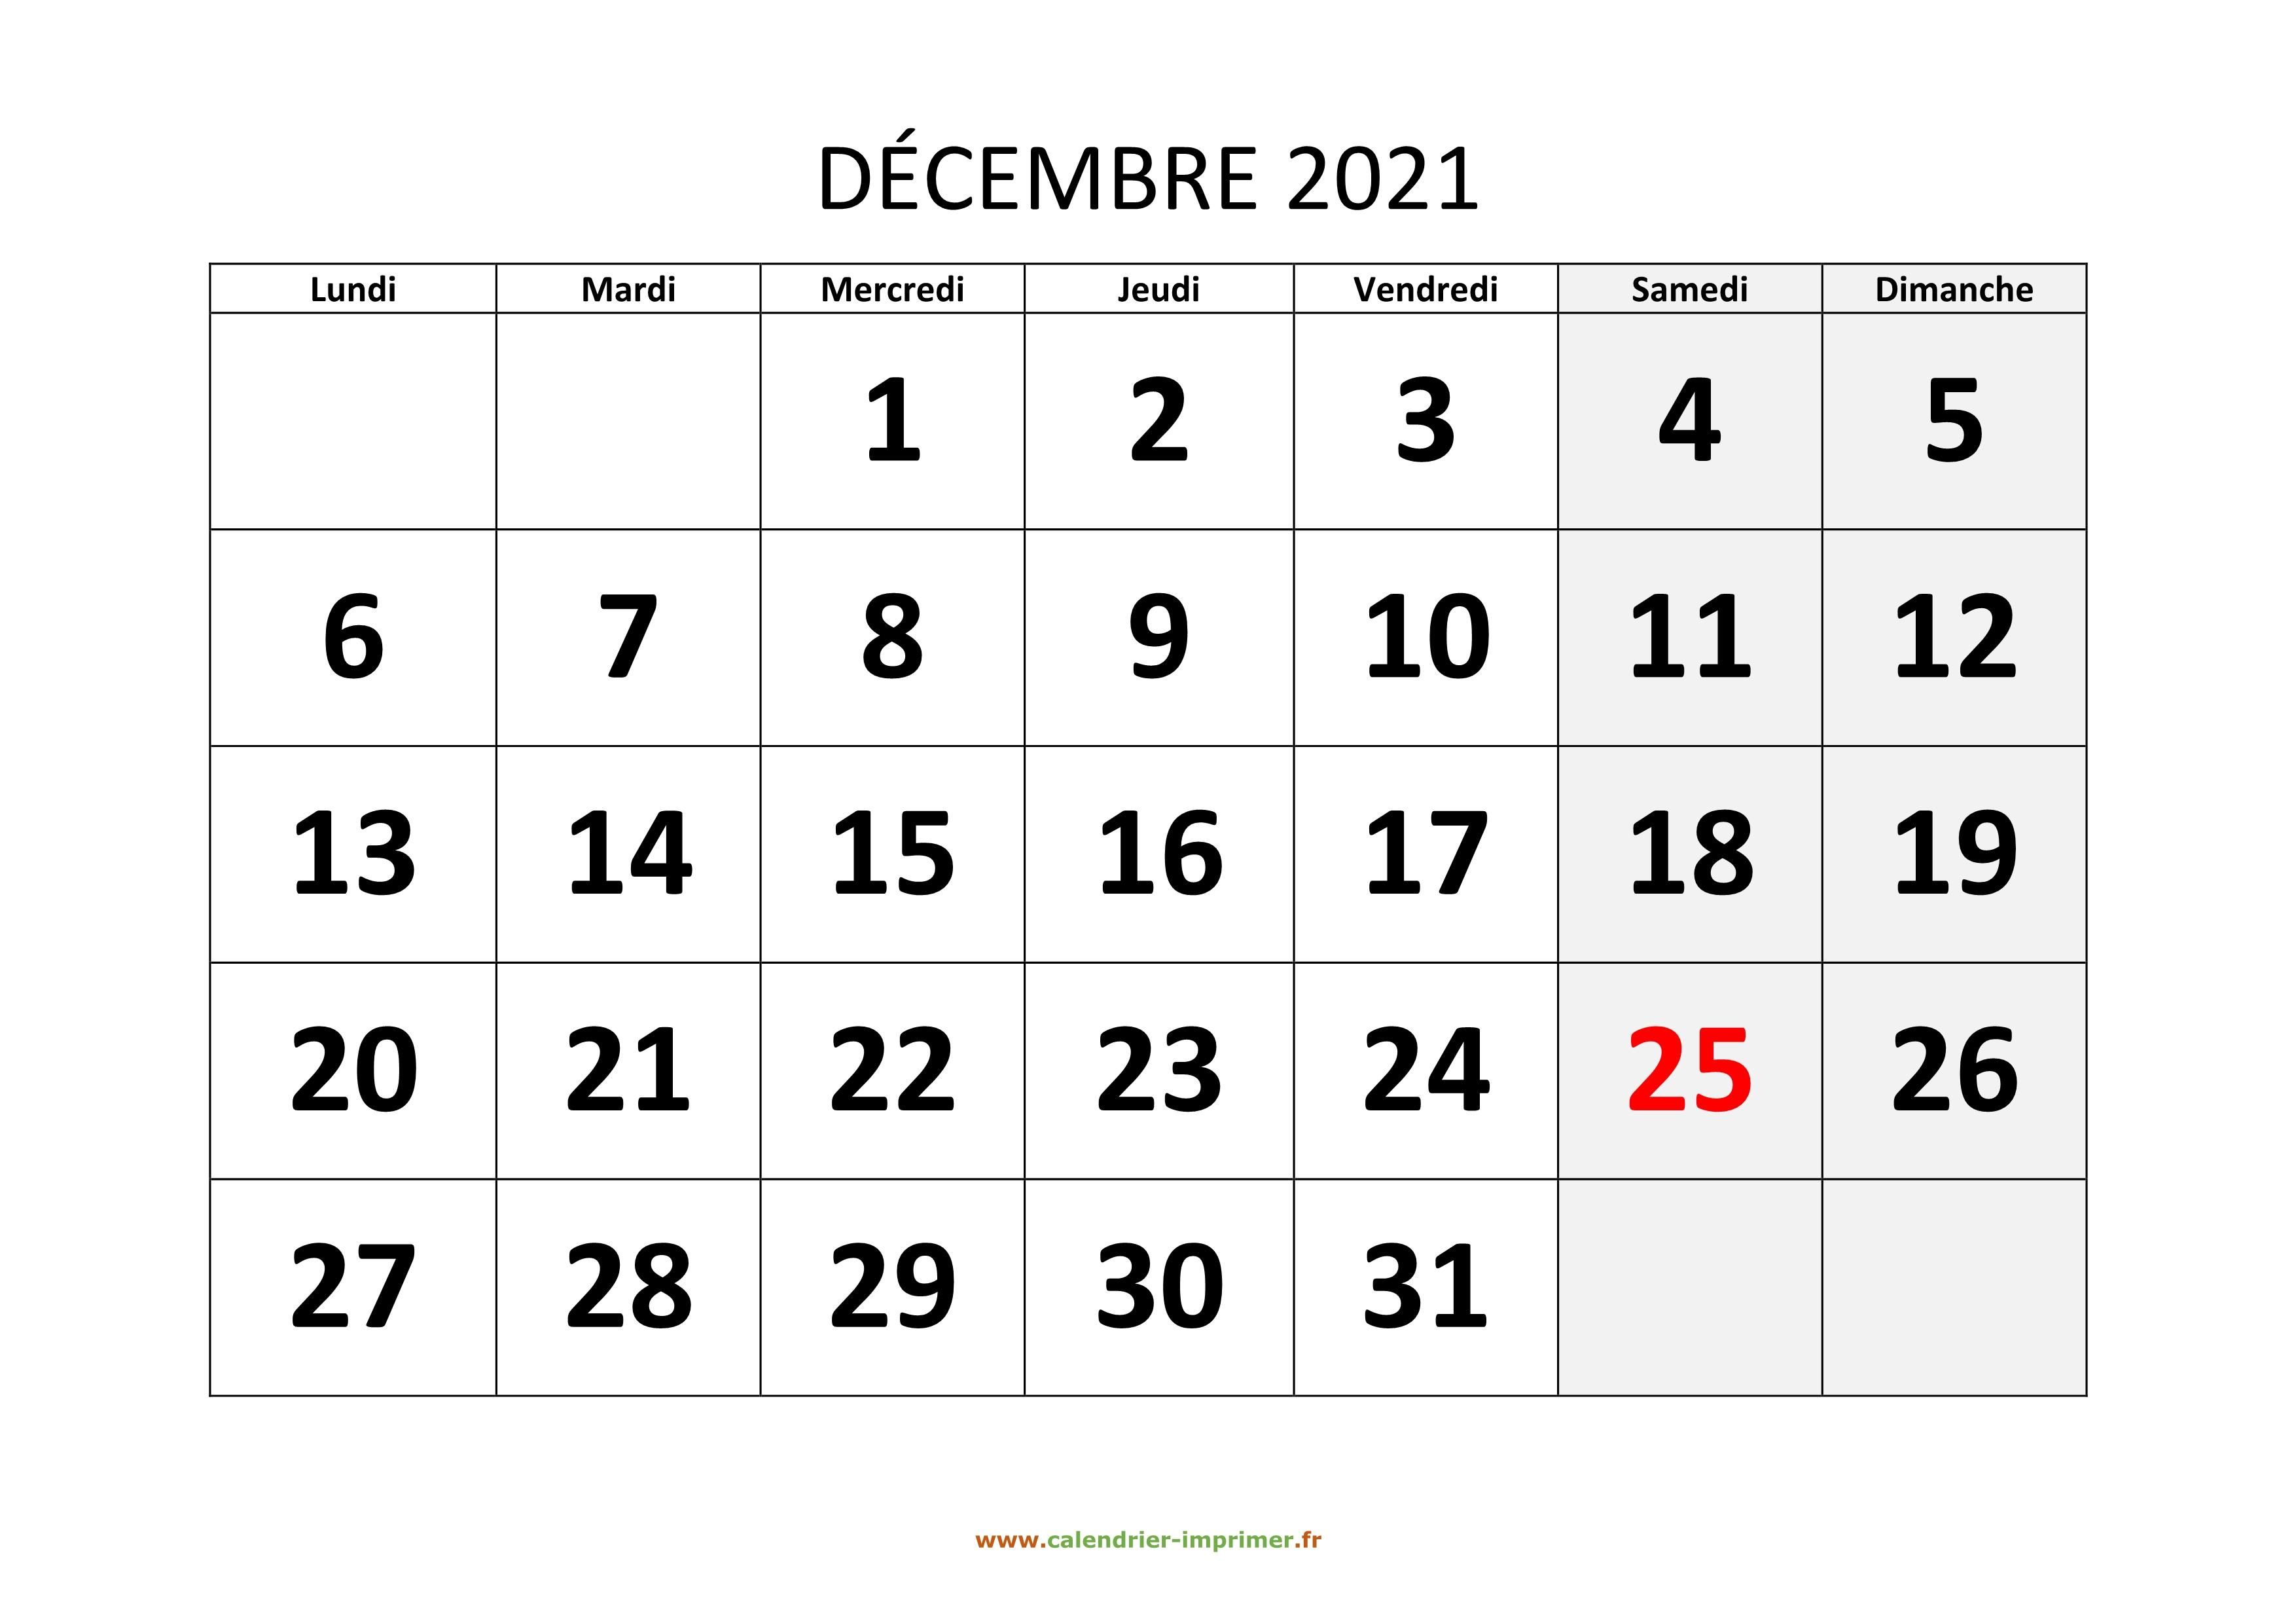 Calendrier Décembre 2021 Calendrier Décembre 2021 à imprimer